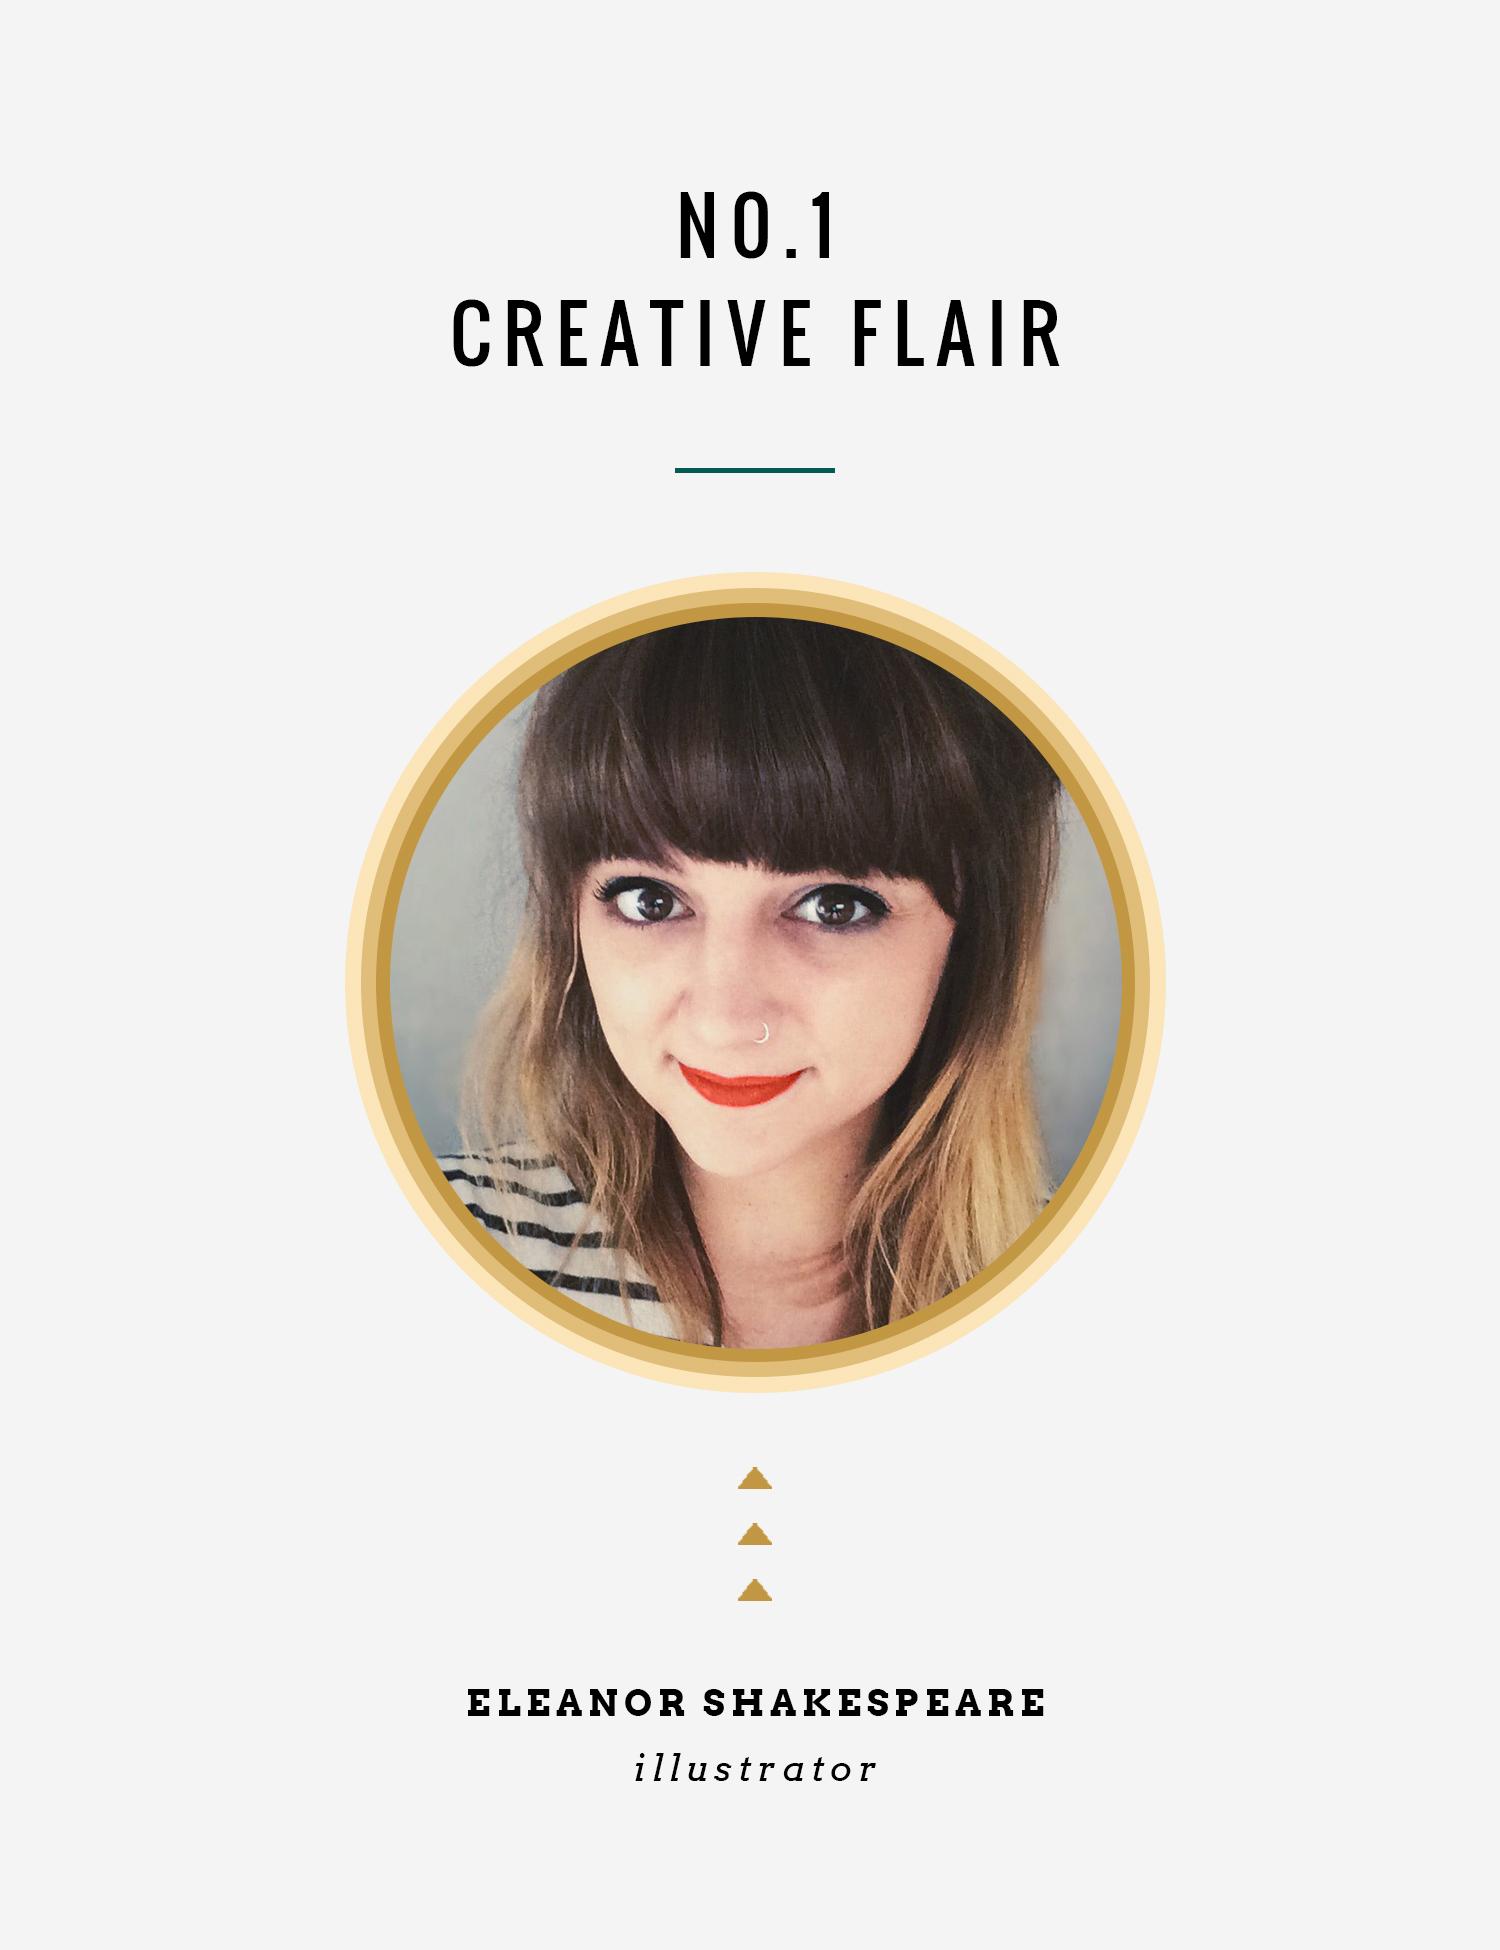 CreativeFlair_EleanorShakespeare